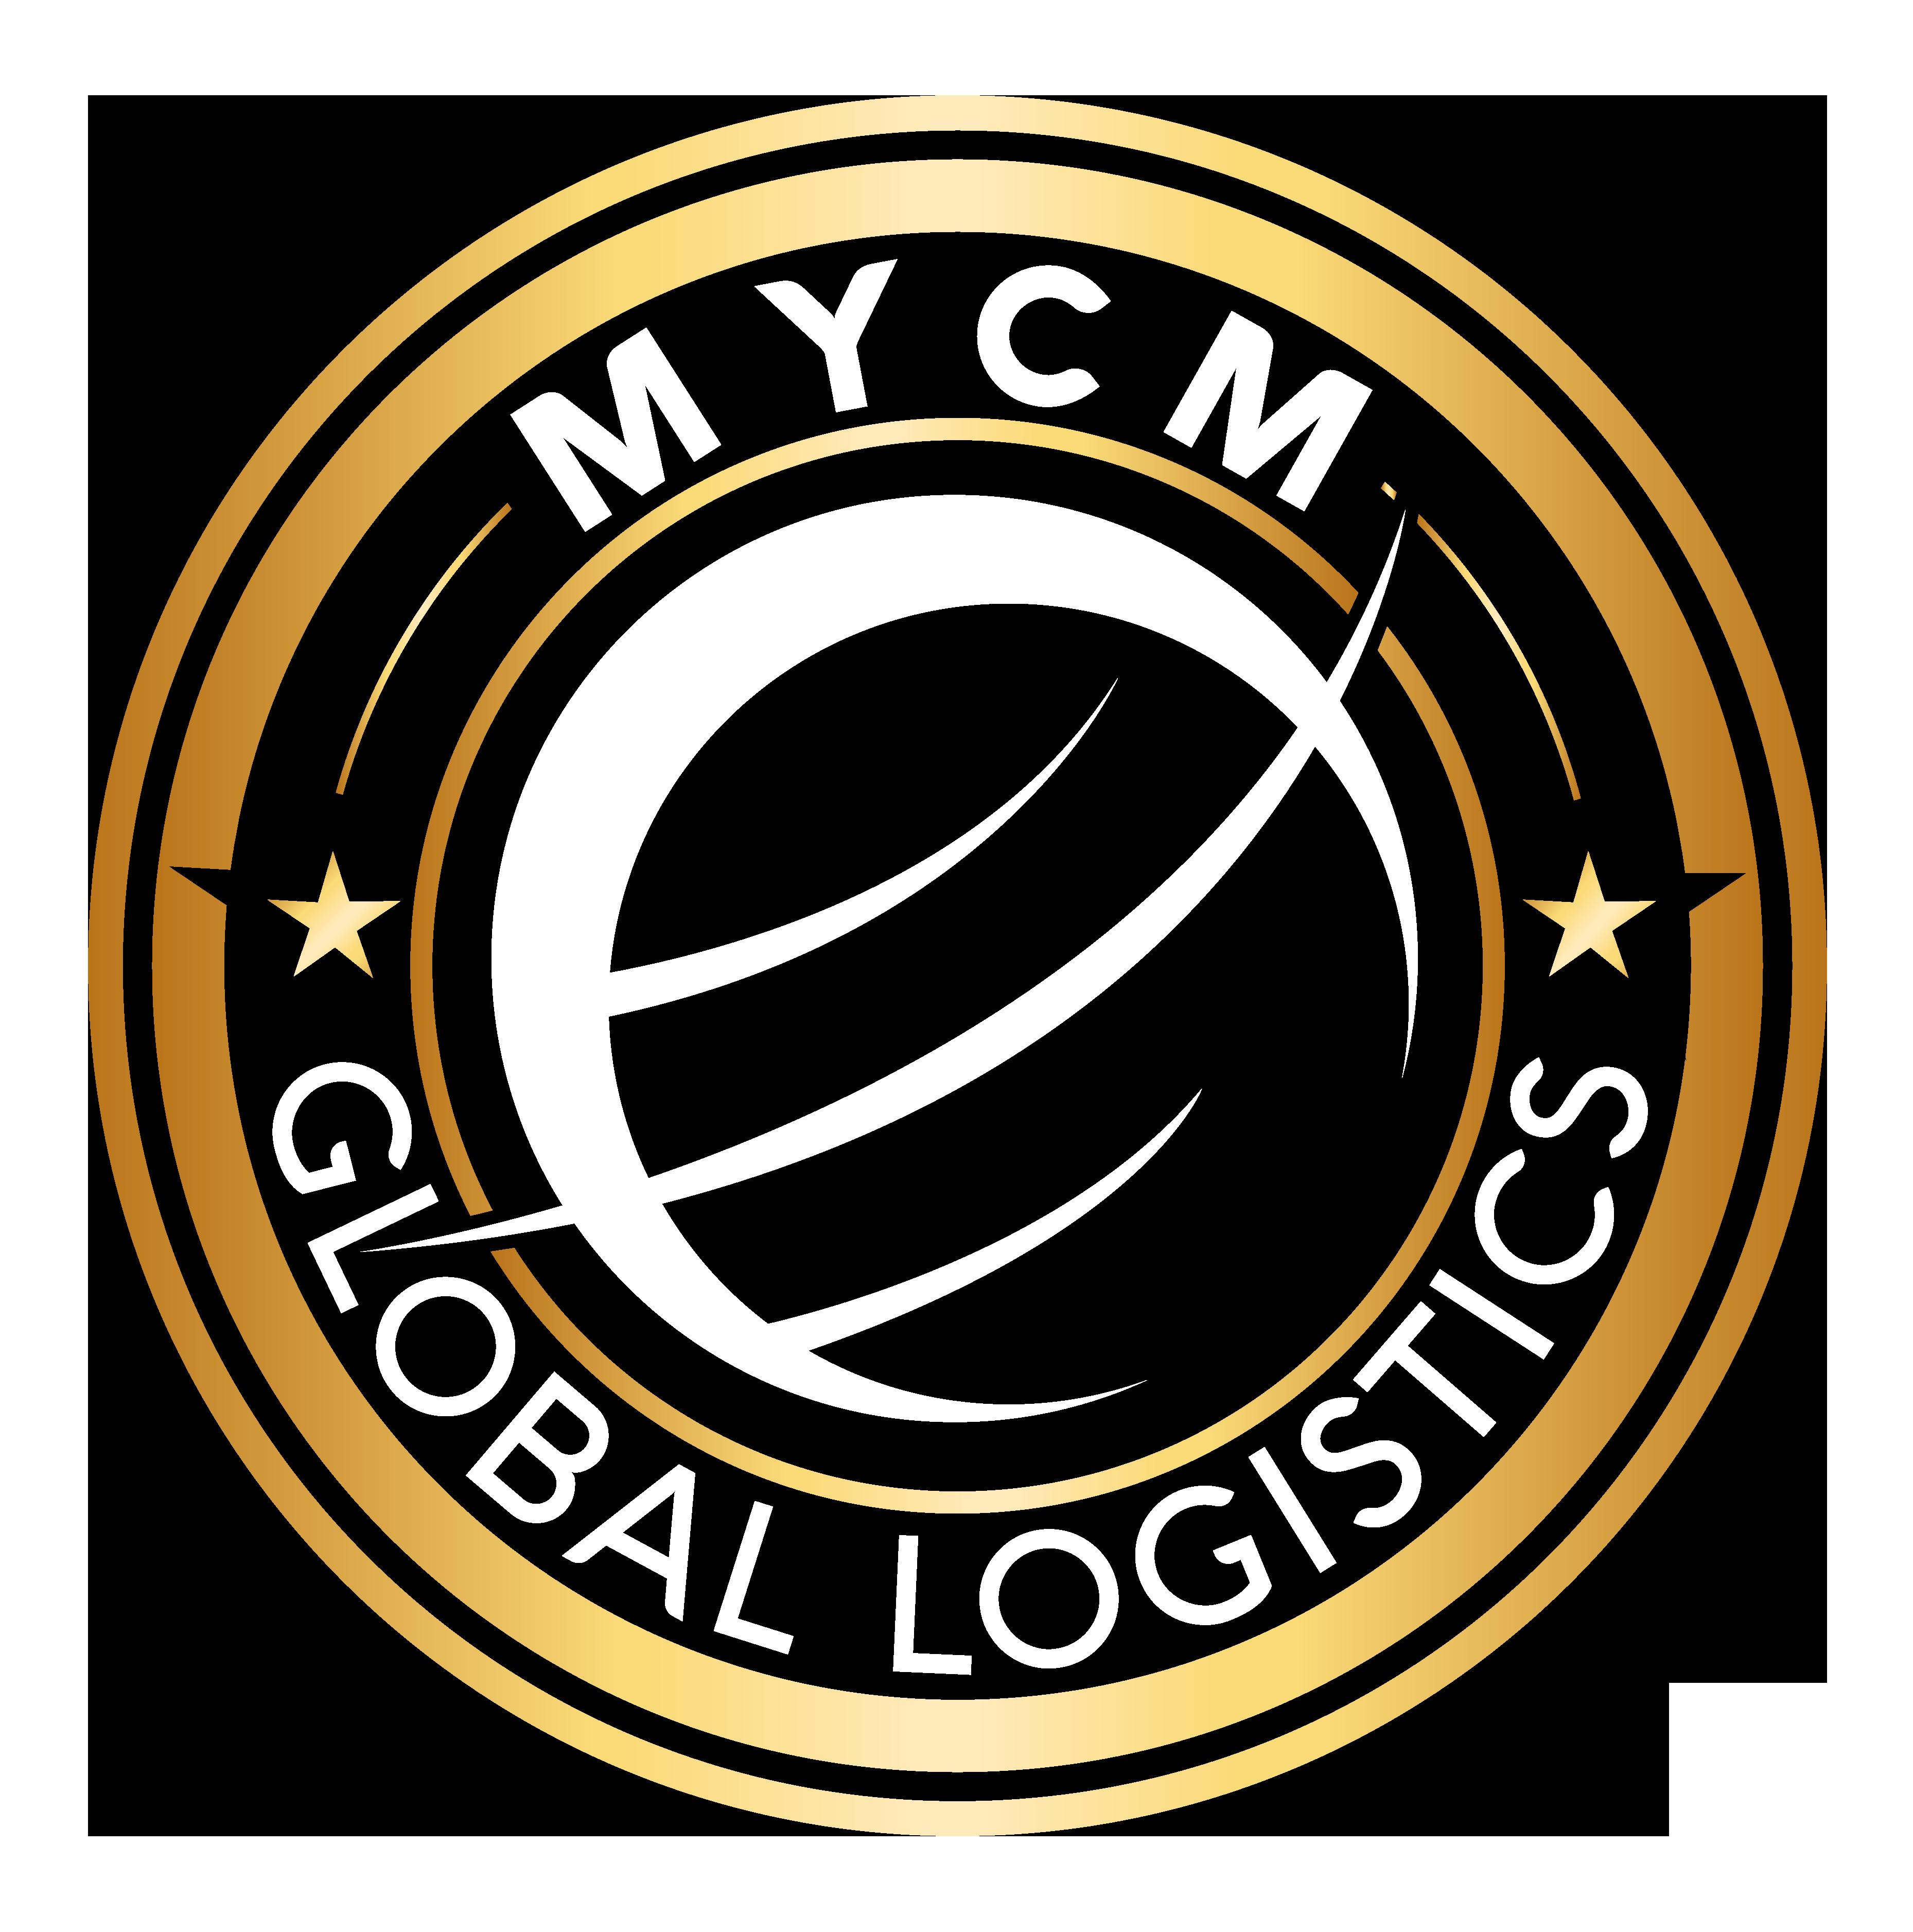 MYCM Global |